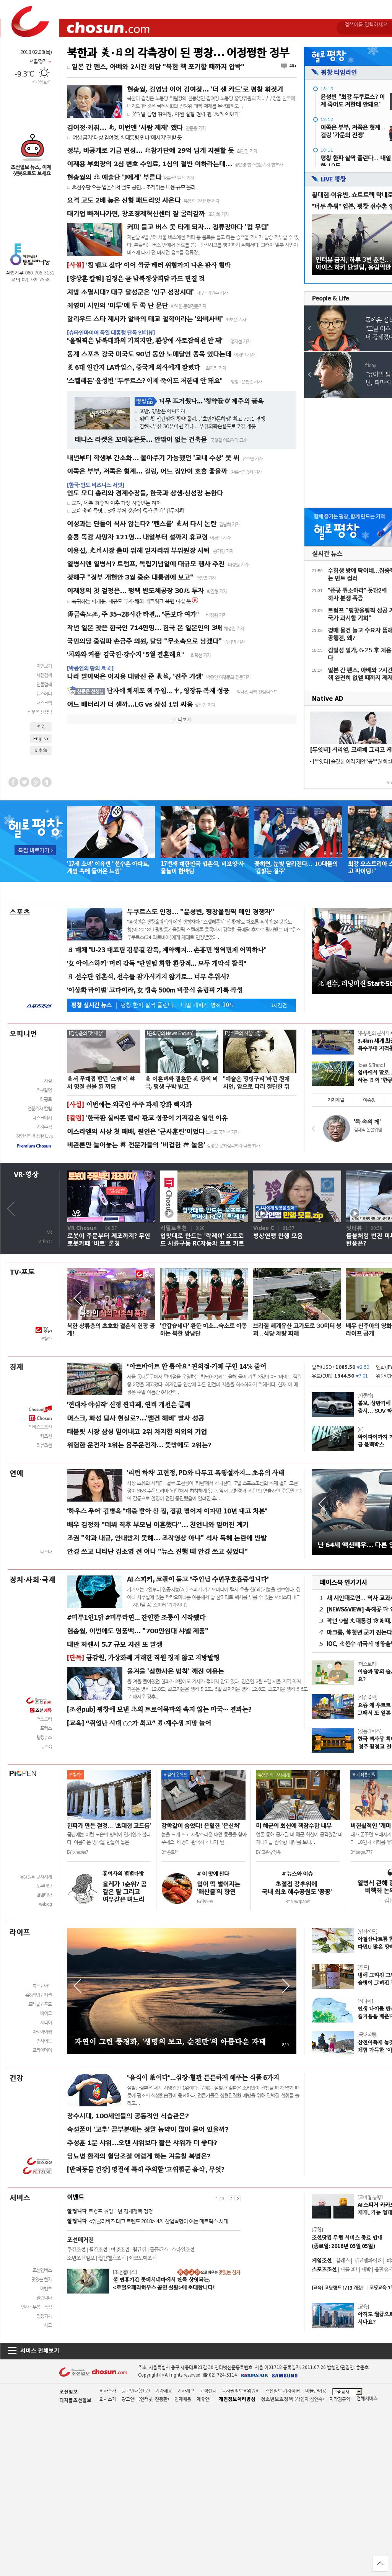 chosun.com at Wednesday Feb. 7, 2018, 10:02 p.m. UTC